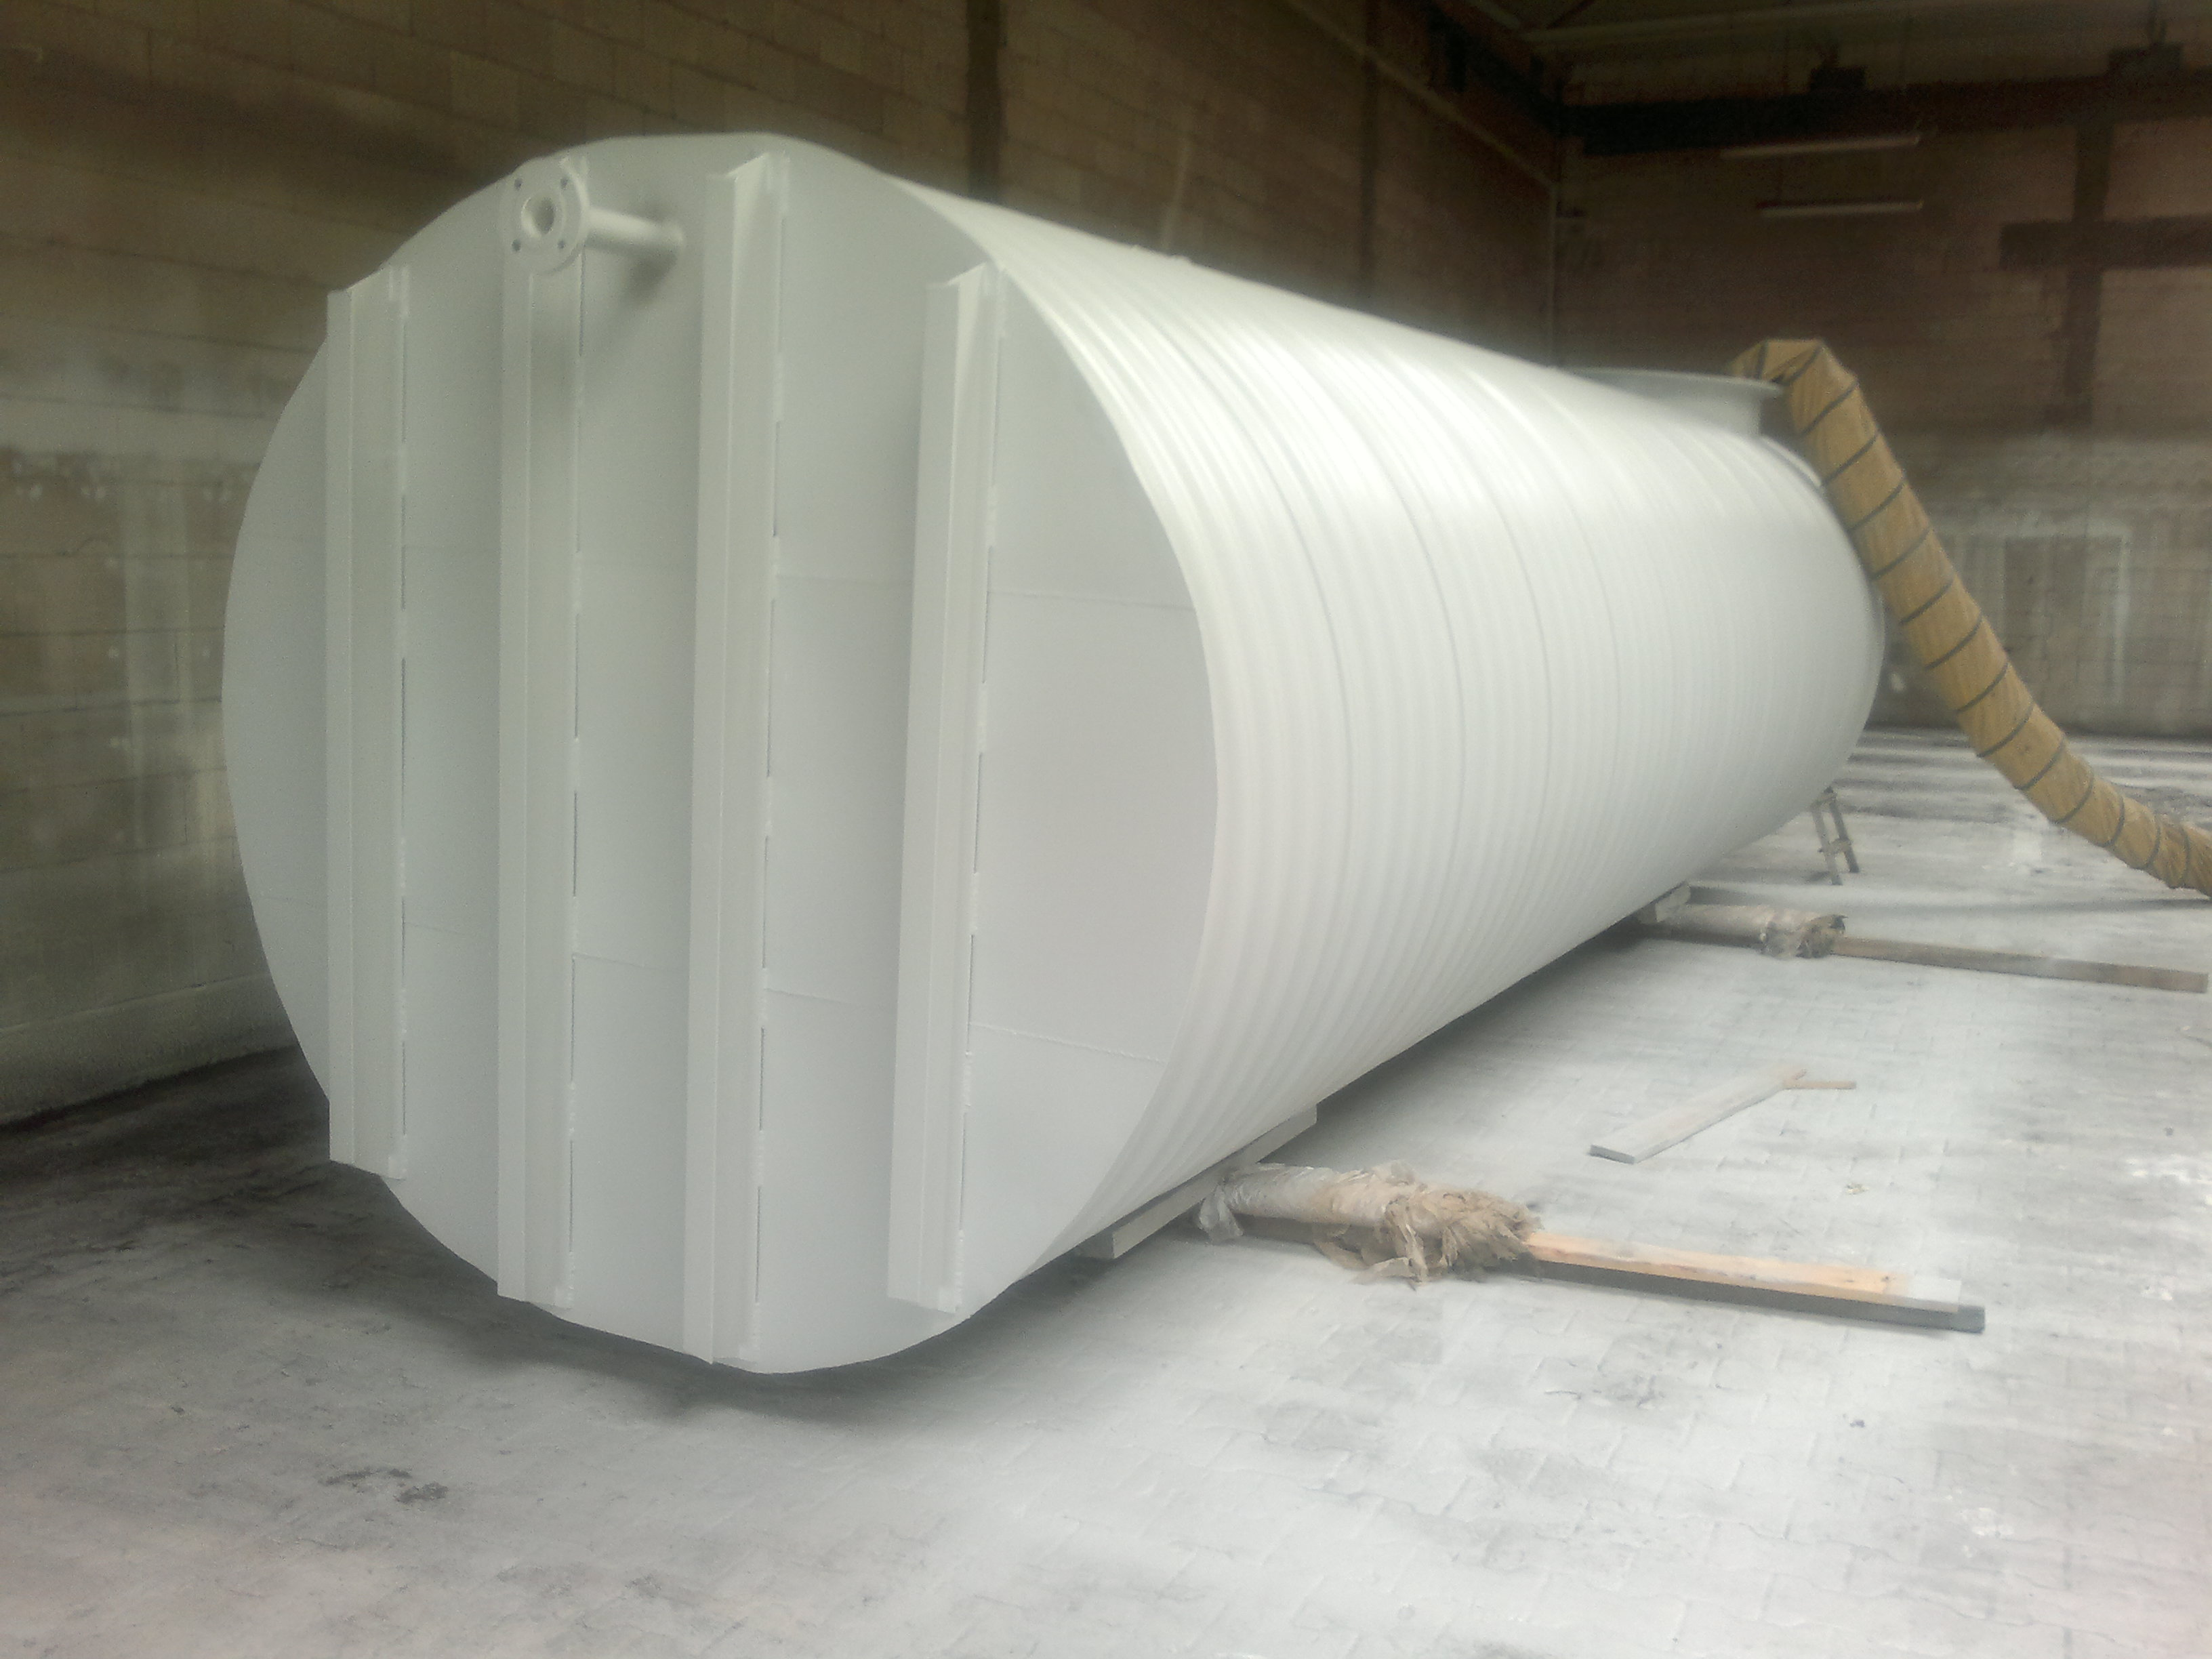 Bardzo dobry Zbiorniki wody pitnej - OKSYDAN GT67